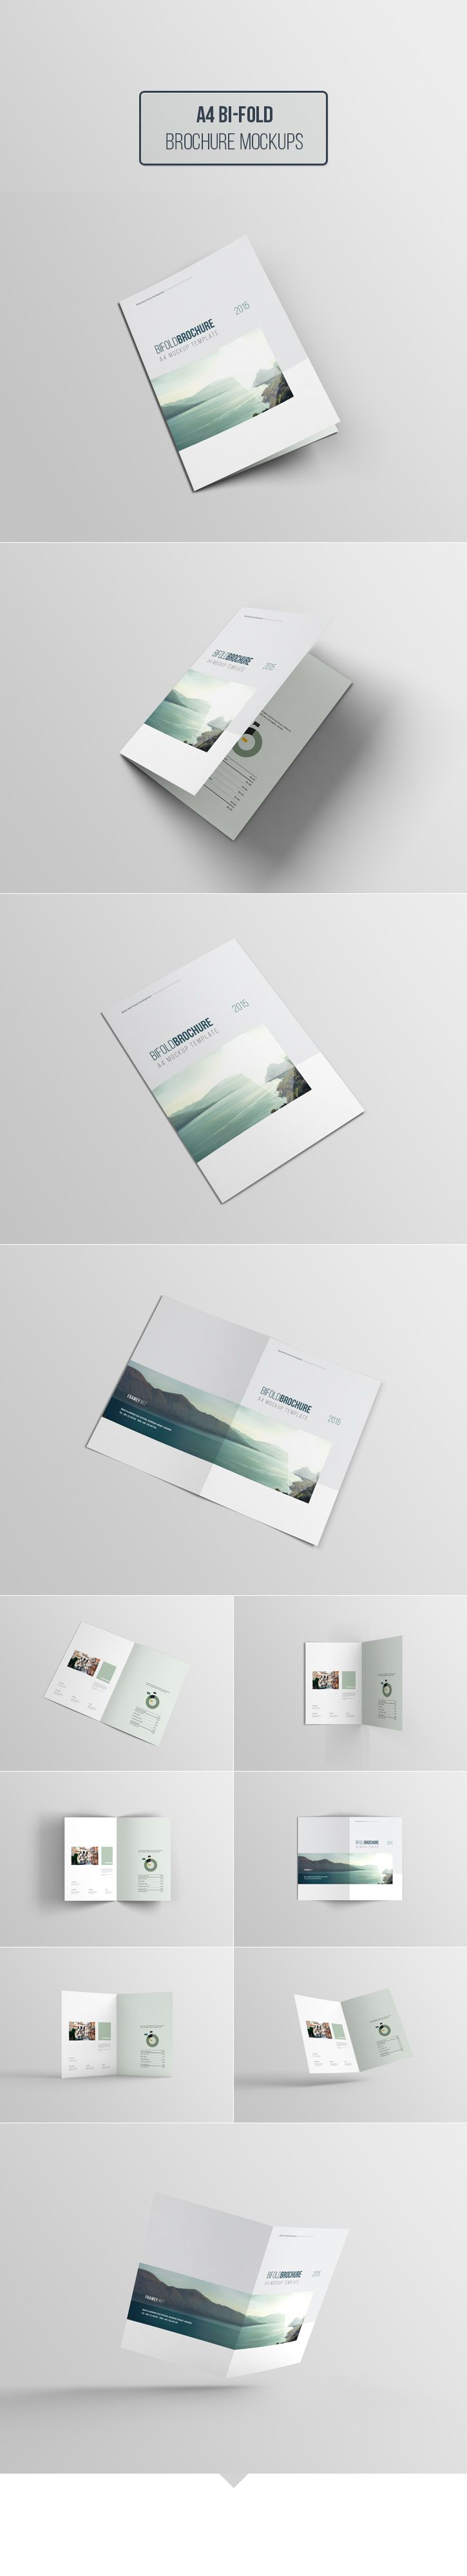 Free Dowload - A4 Bi-Fold Brochure Mockups